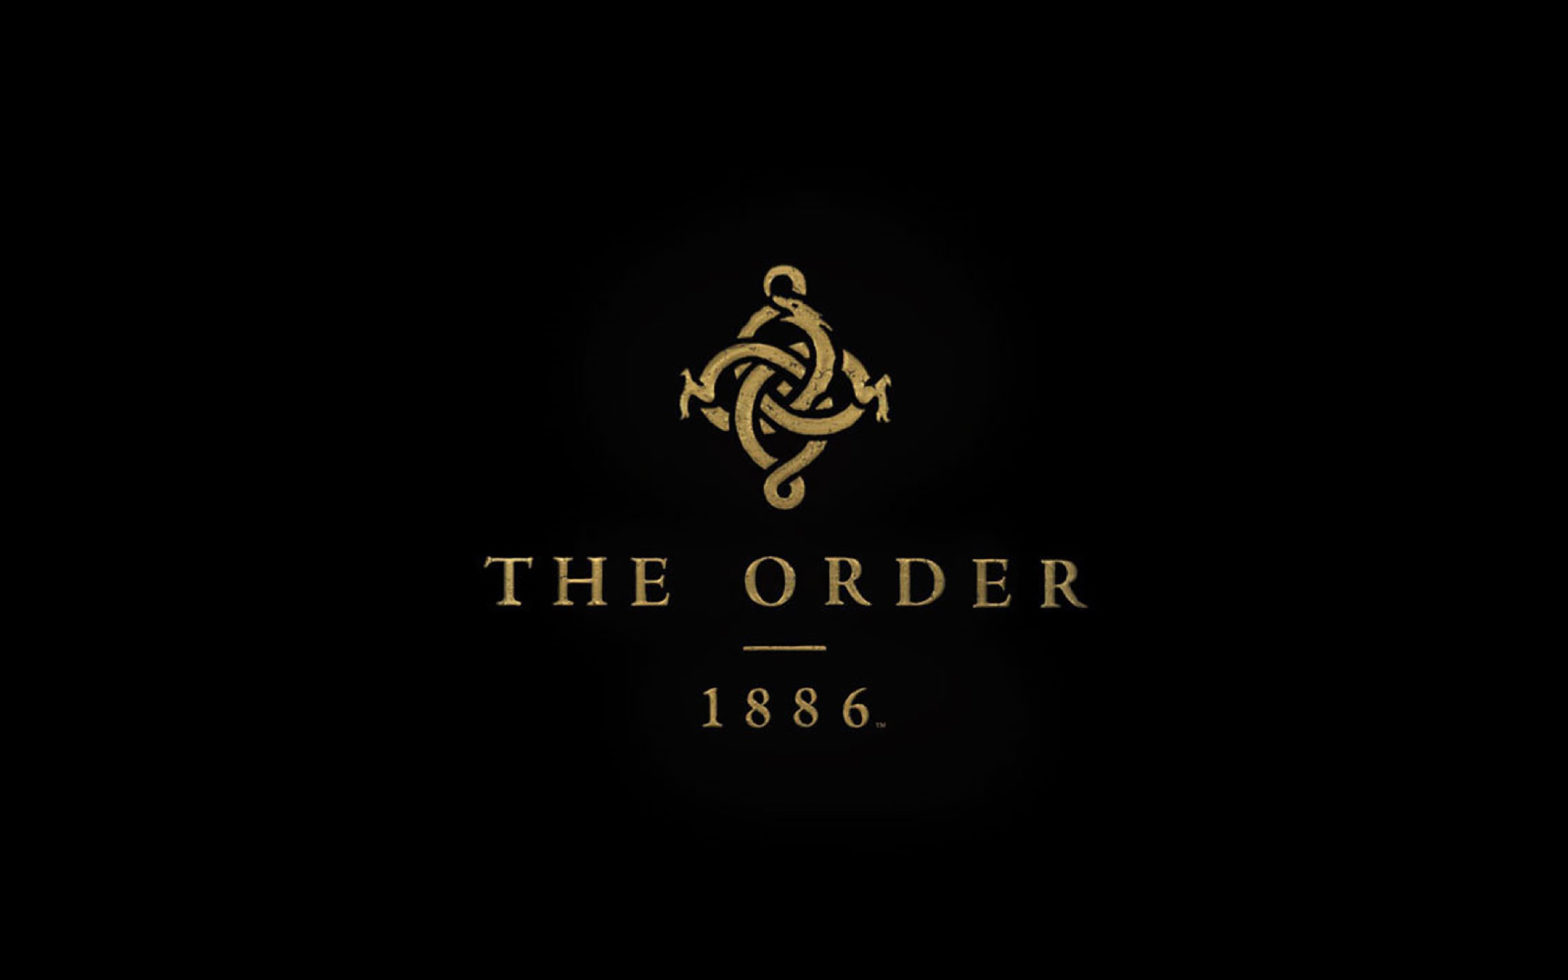 The Order: 1886 Teaser